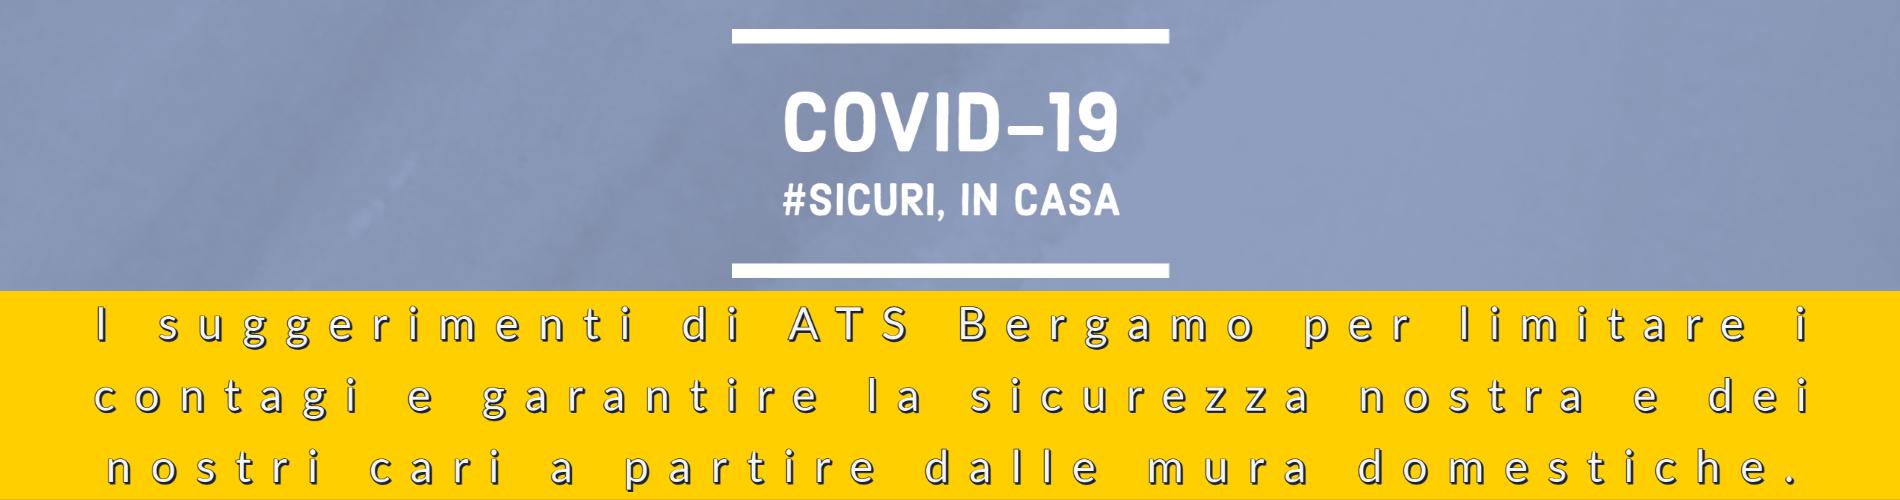 Covid-19 #Sicuri, in casa